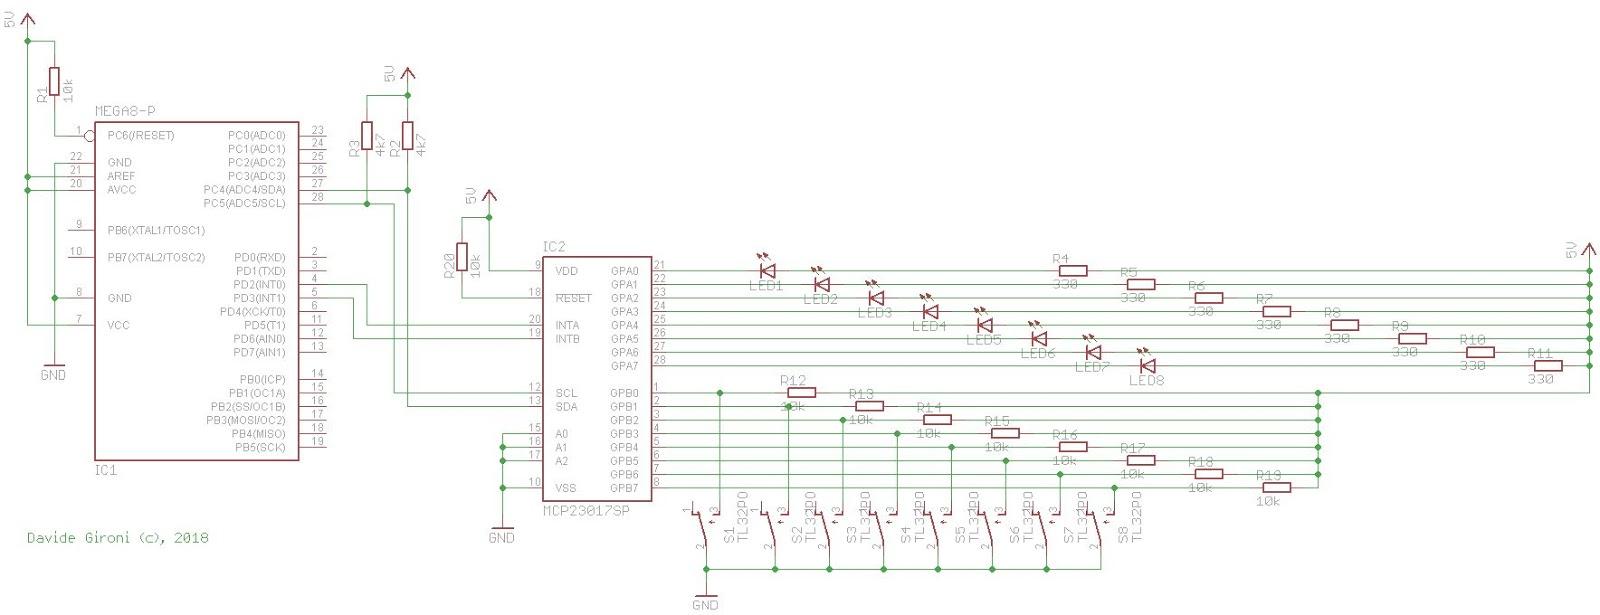 Davide Gironi: Usa a MCP23017 GPIO port expander with an